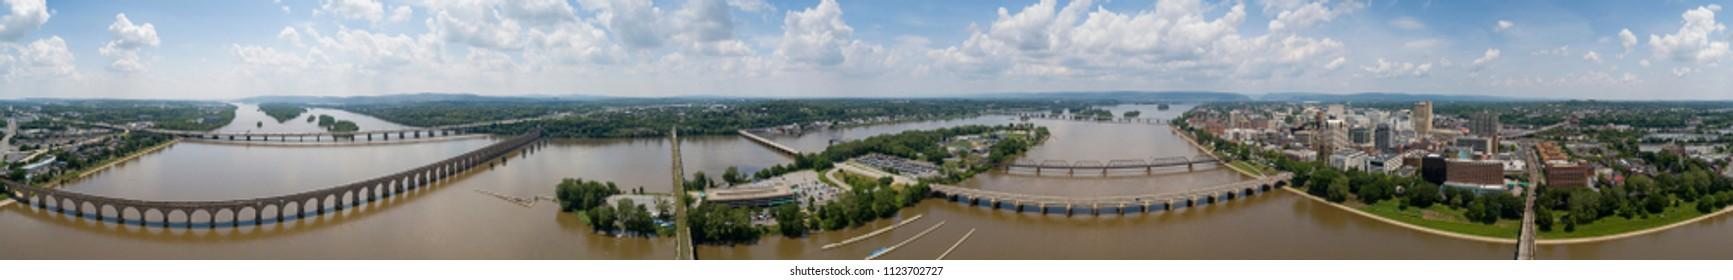 Harrisburg Pennsylvania Capital CIty Aerial View From City Island Susquehanna River